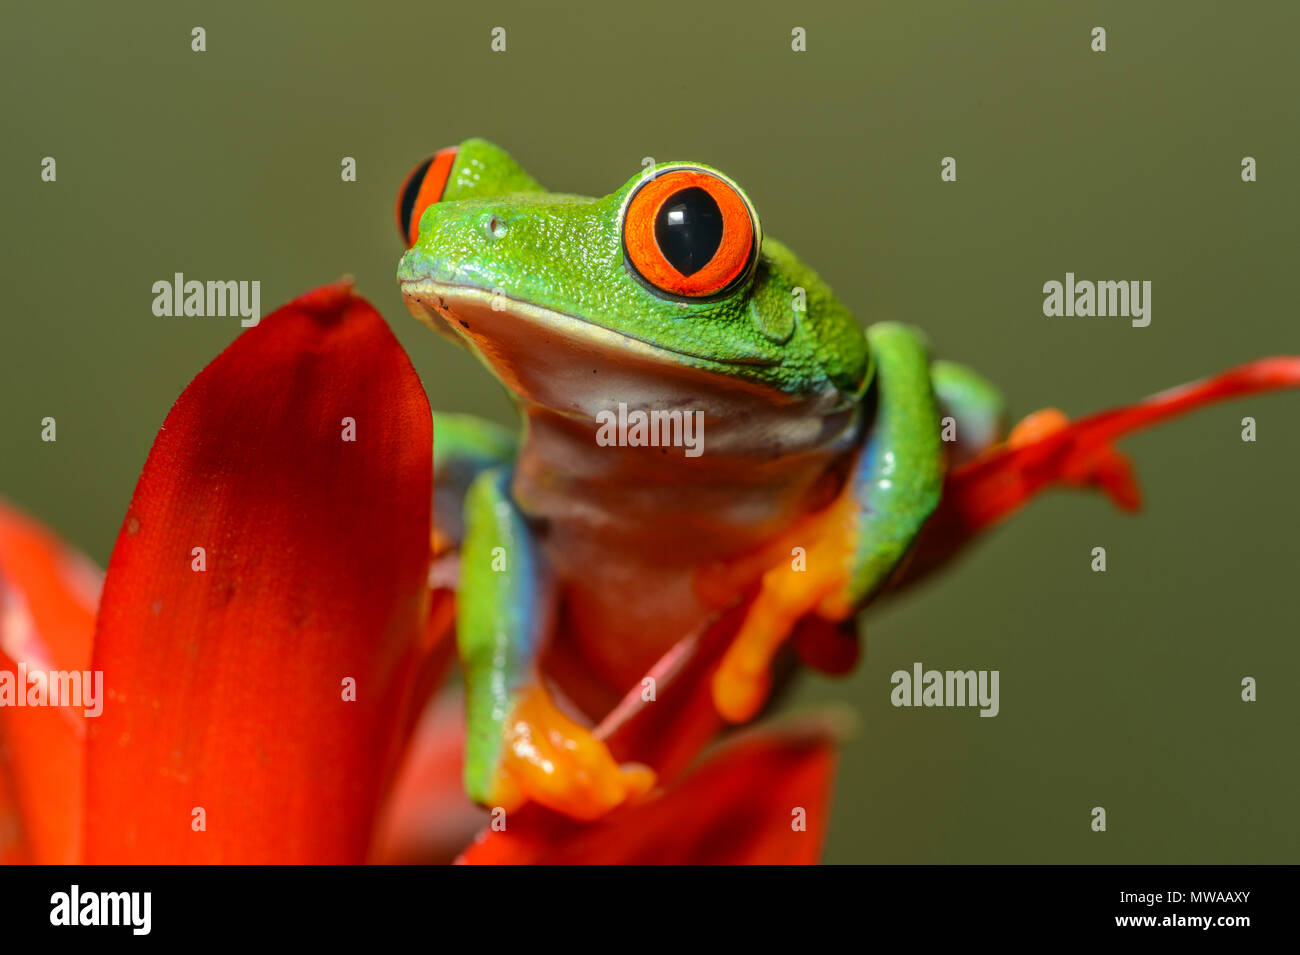 Red-eyed Raganella (Agalychnis callidryas), prigionieri Reptilia reptile zoo, Vaughan, Ontario, Canada Immagini Stock